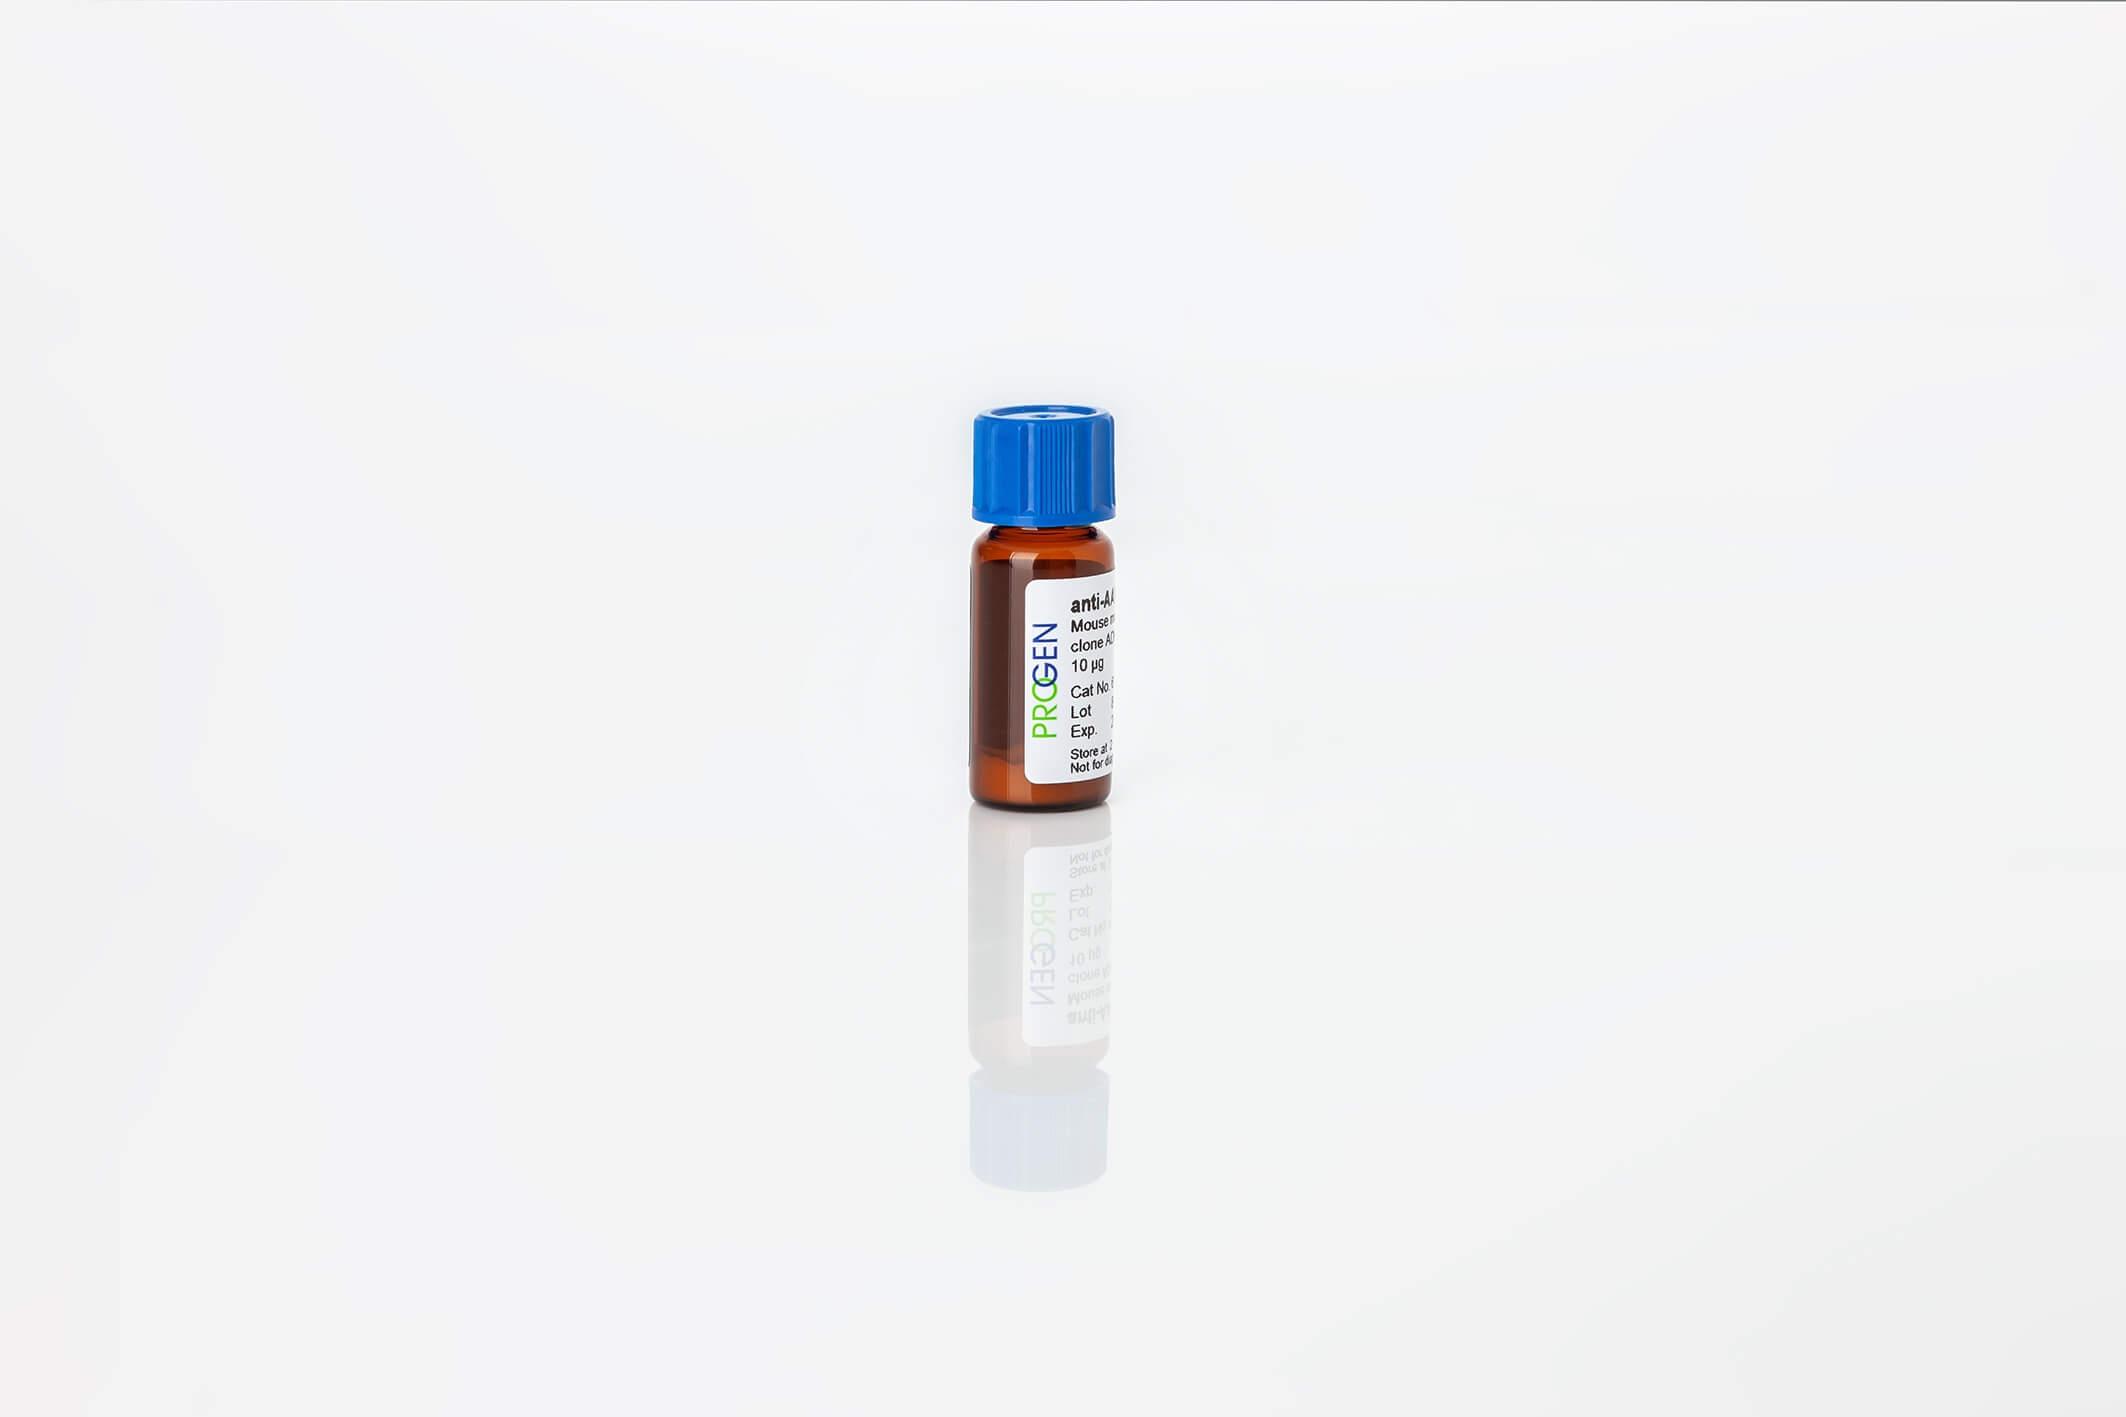 anti-Carcinoembryonic Antigen rabbit polyclonal, serum